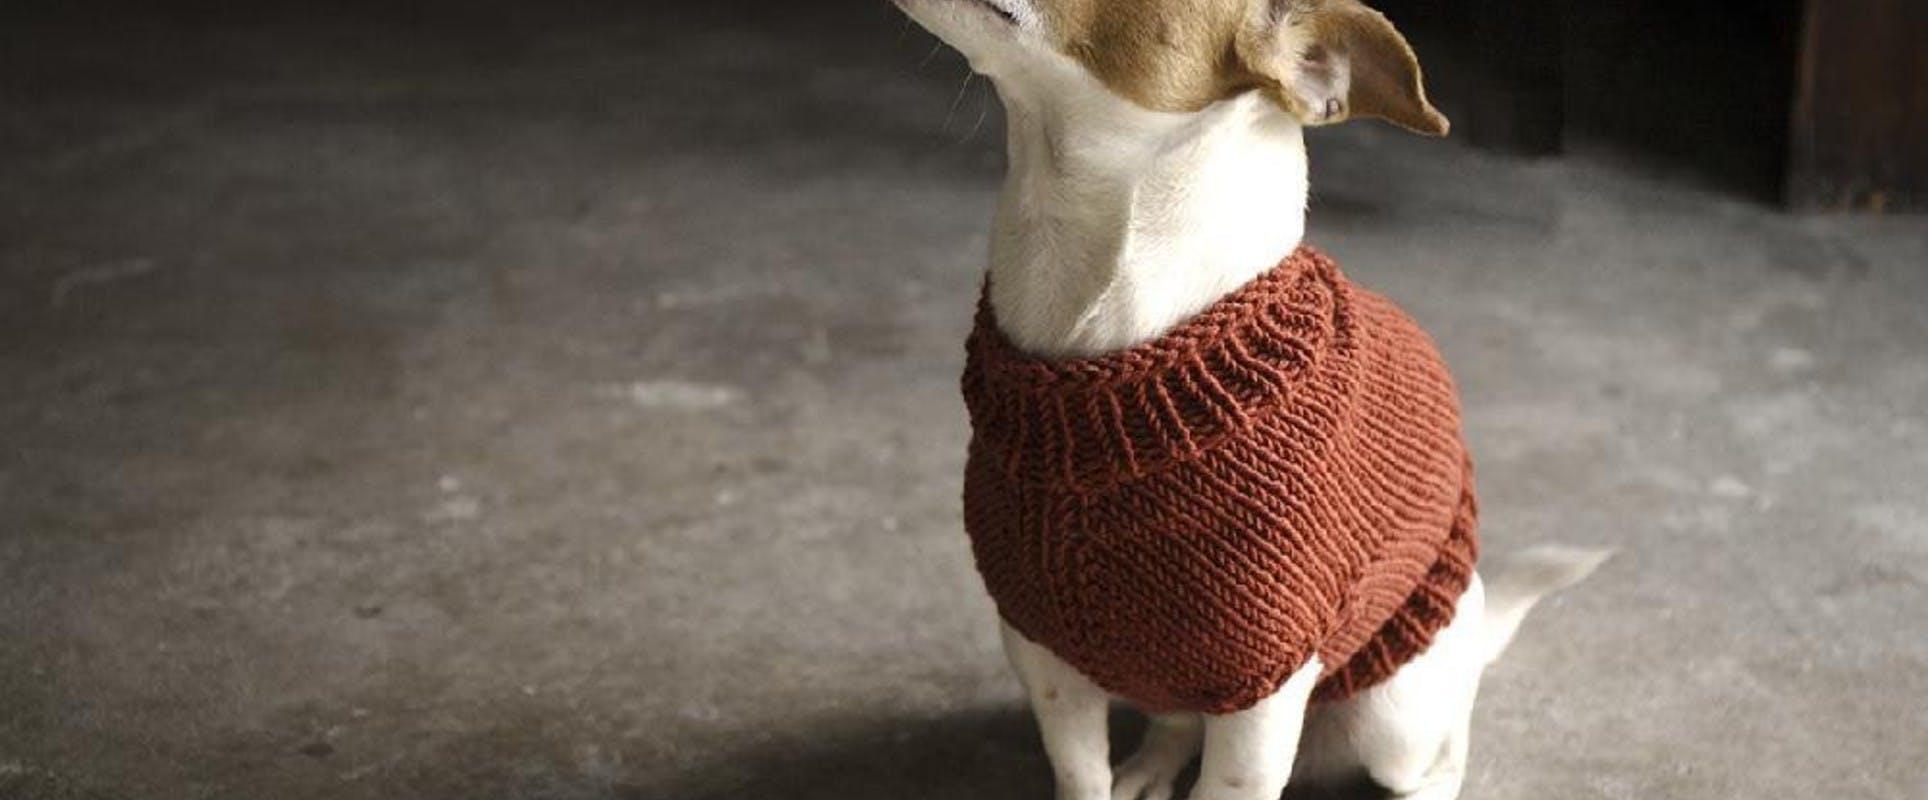 15+ Amigurumi Dog Free Crochet Pattern - Amigurumi | 800x1928